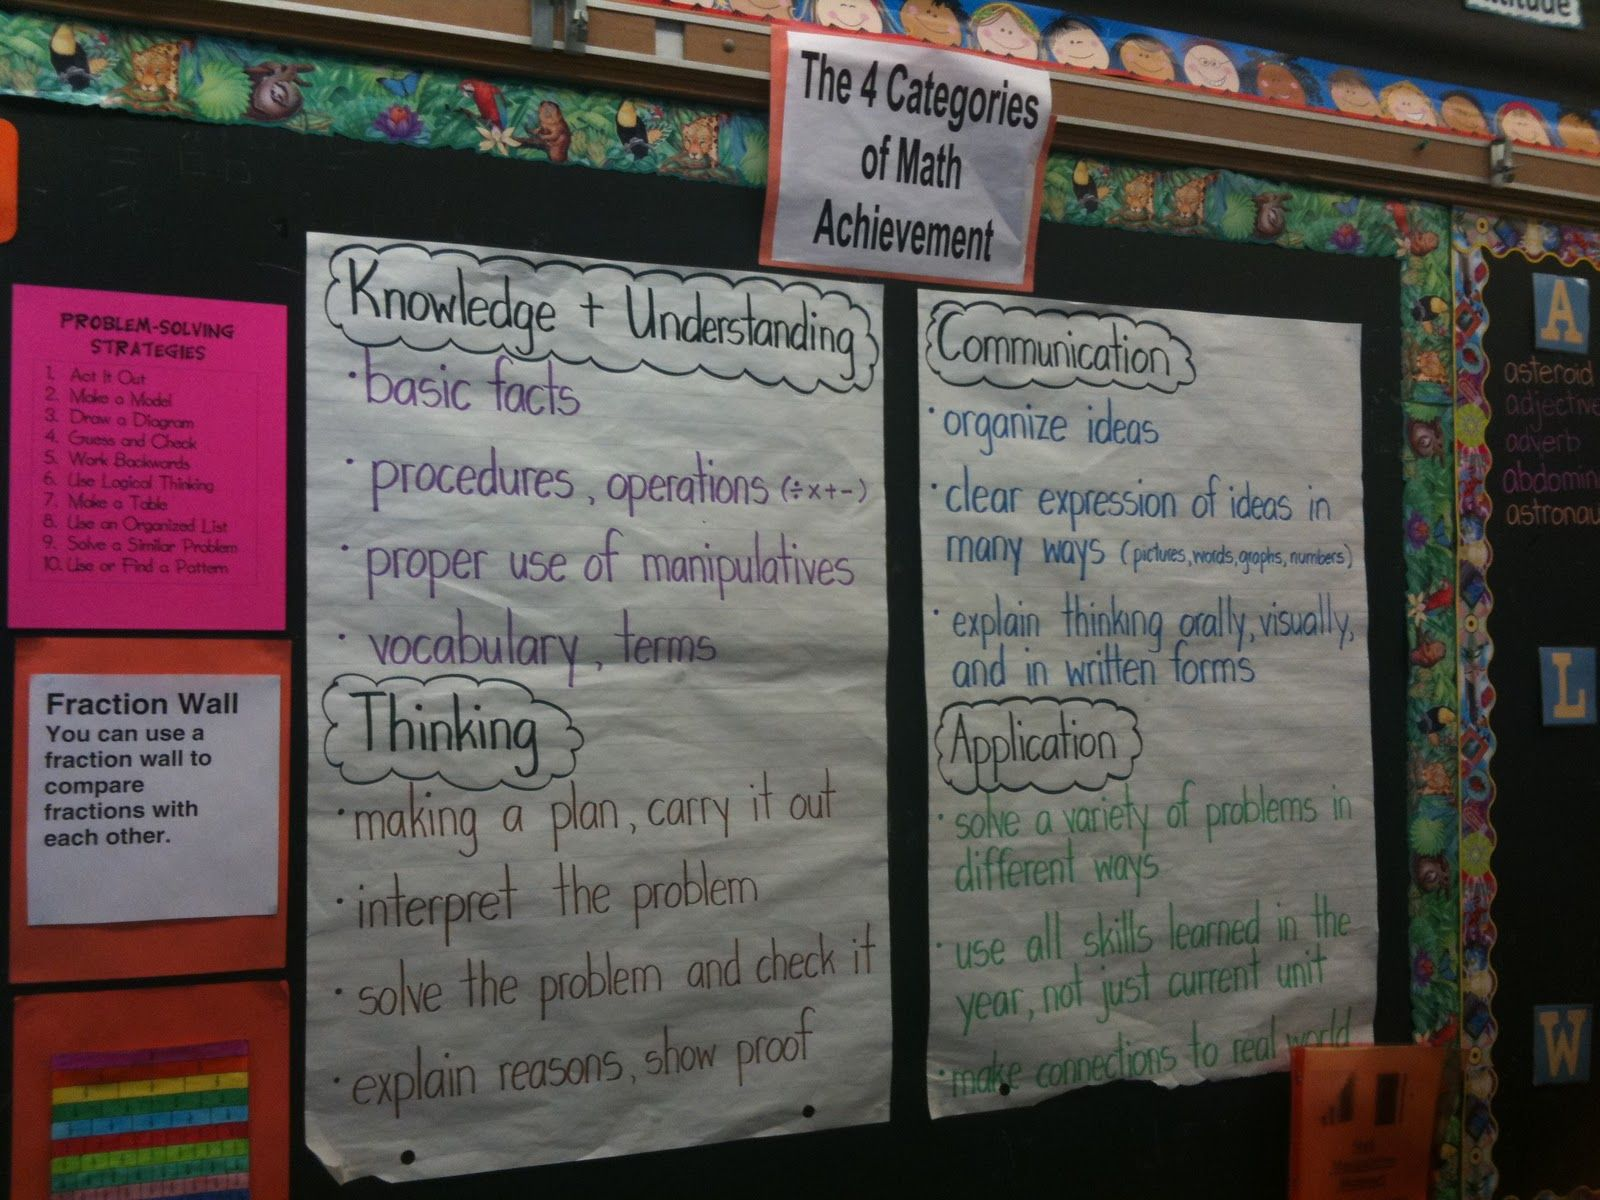 Math Categories Tario Curriculum Math Prob Solving